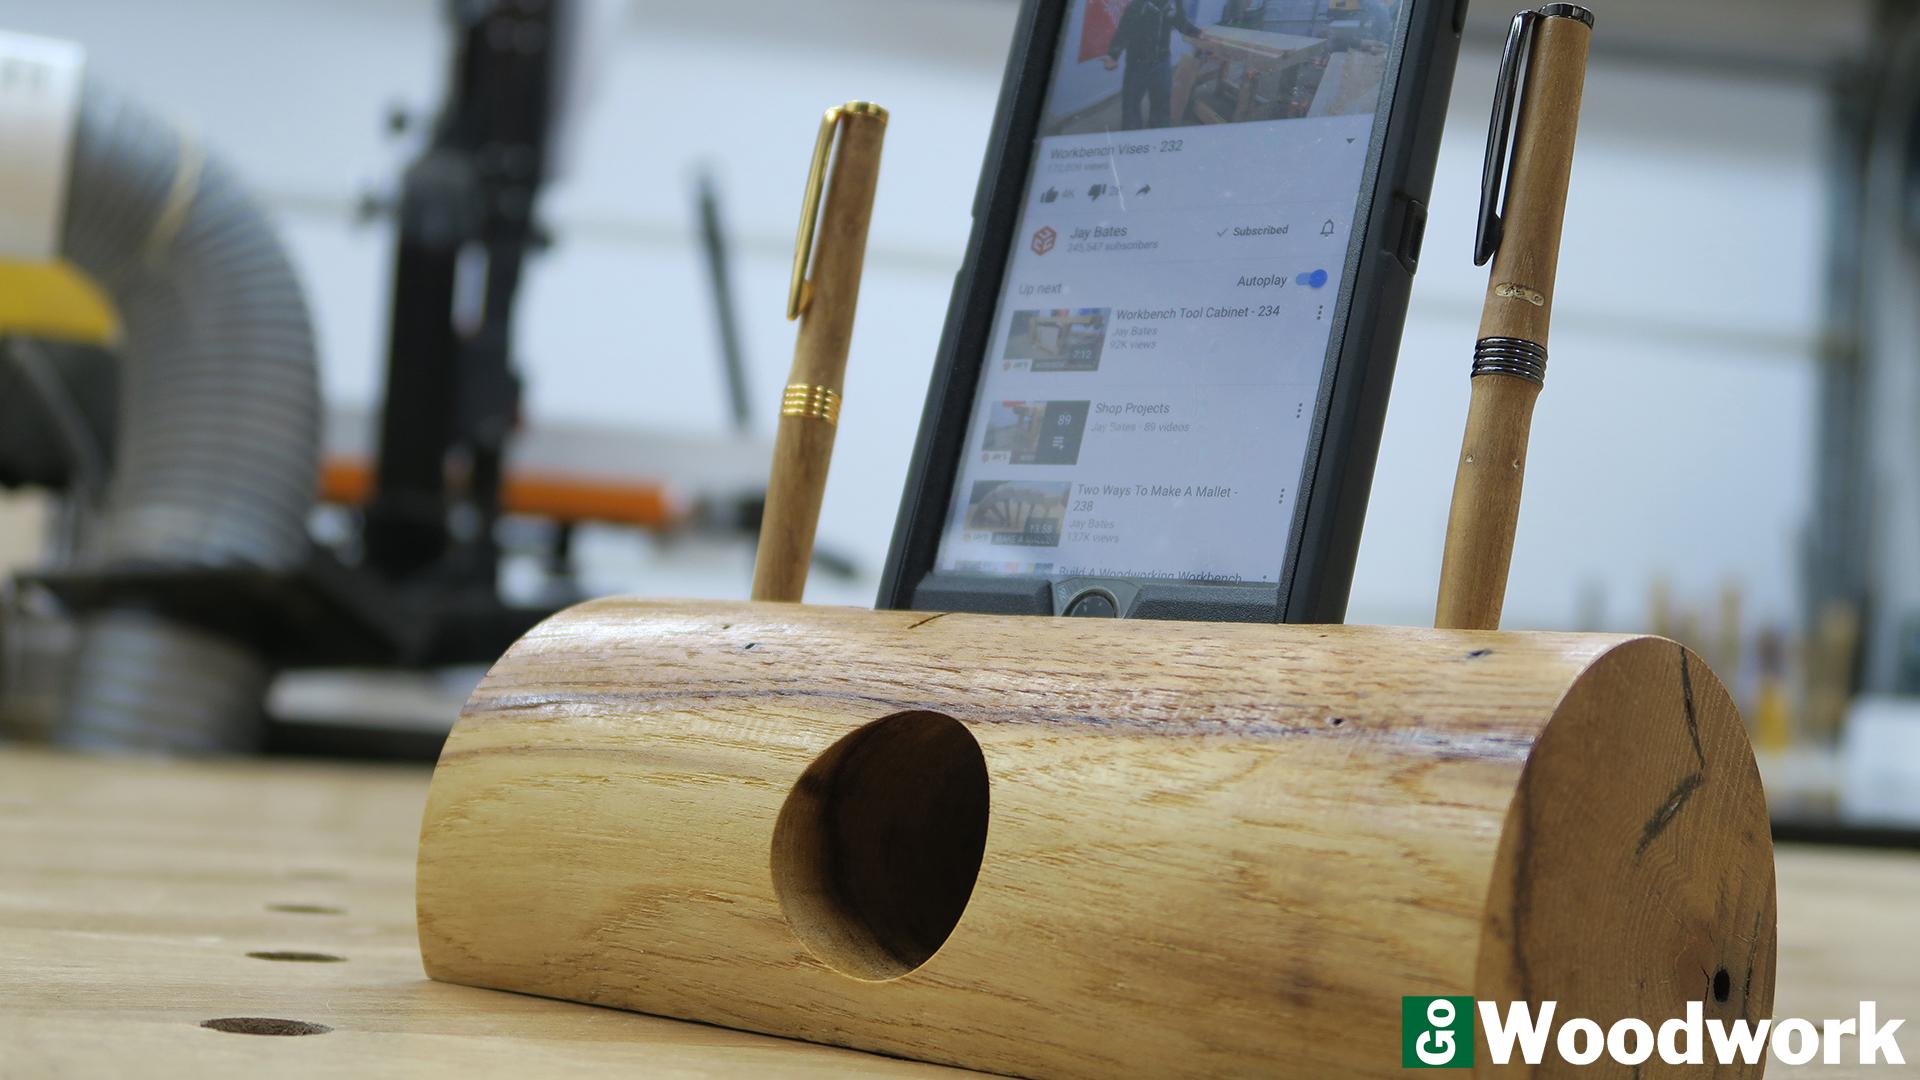 25 Diy Bunk Beds With Plans: Phone Speaker Amplifier